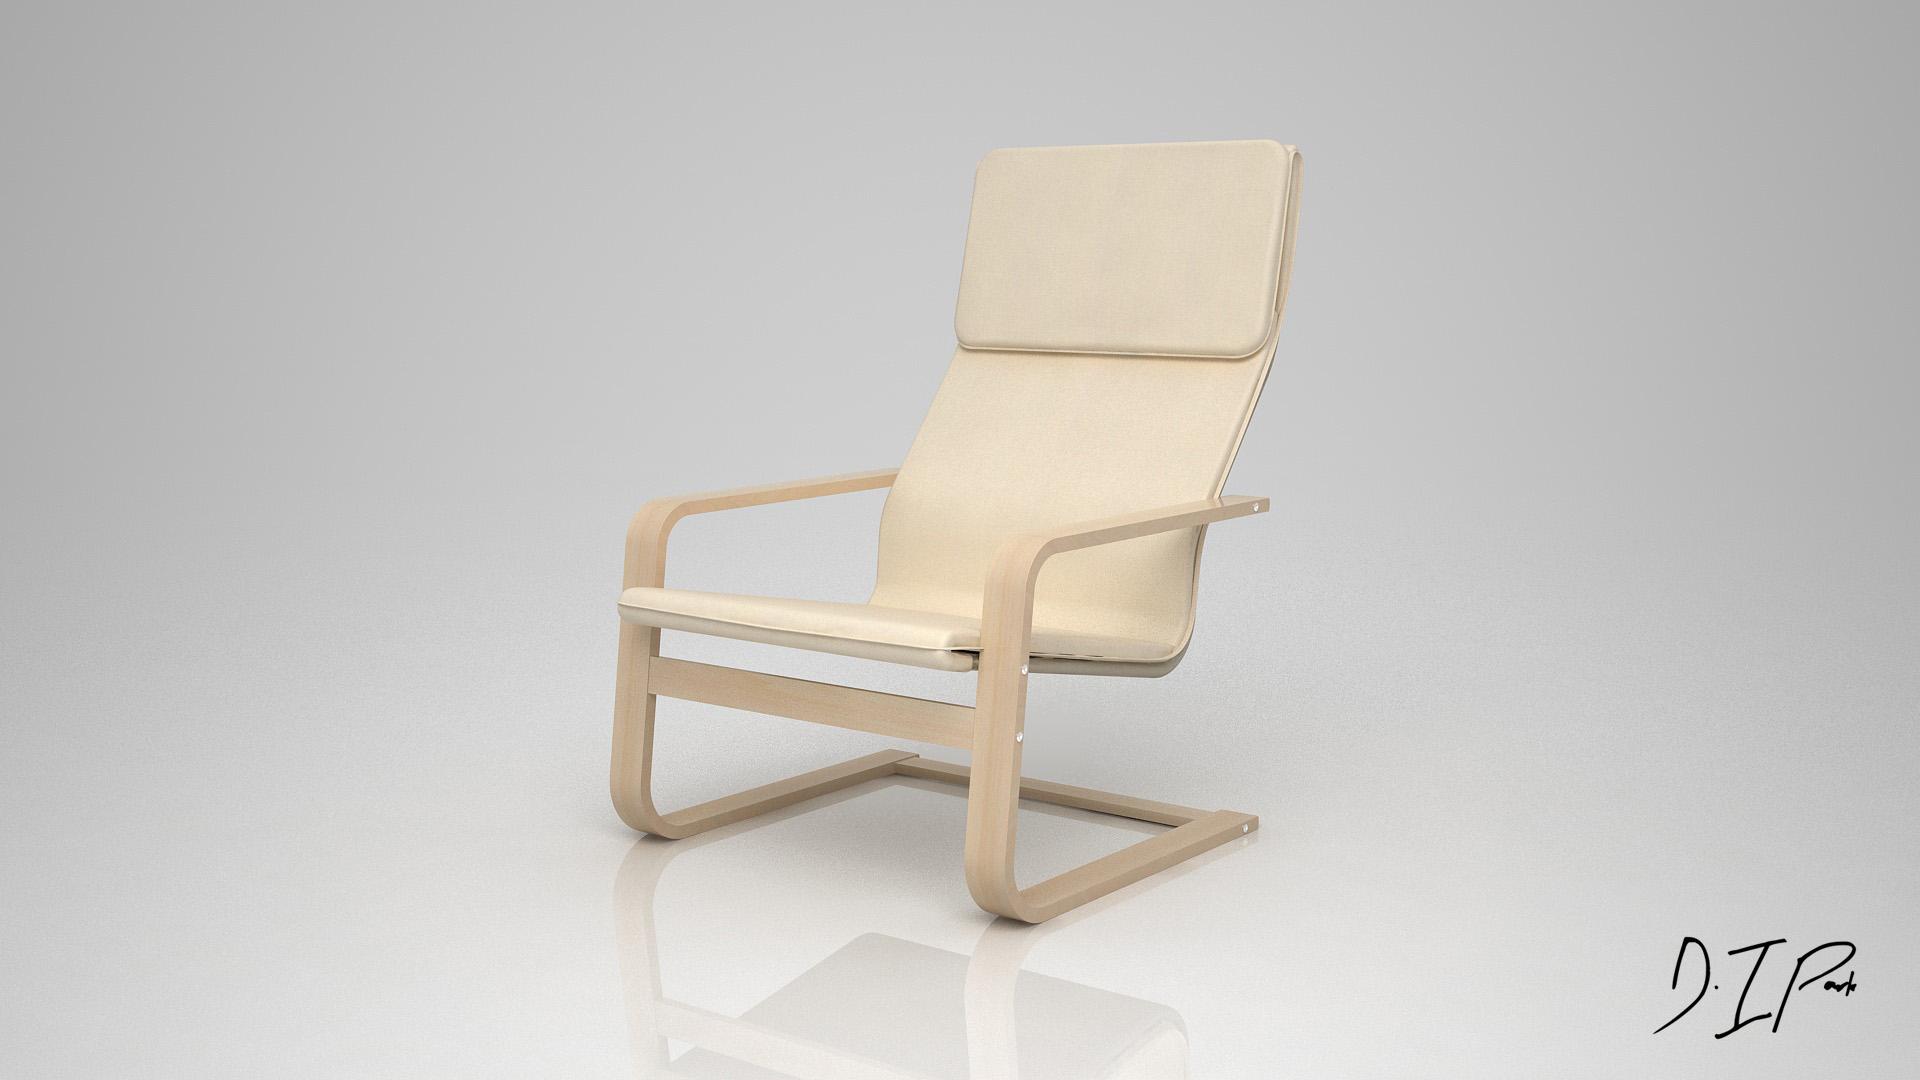 Remarkable Ikea Pello Creativecarmelina Interior Chair Design Creativecarmelinacom